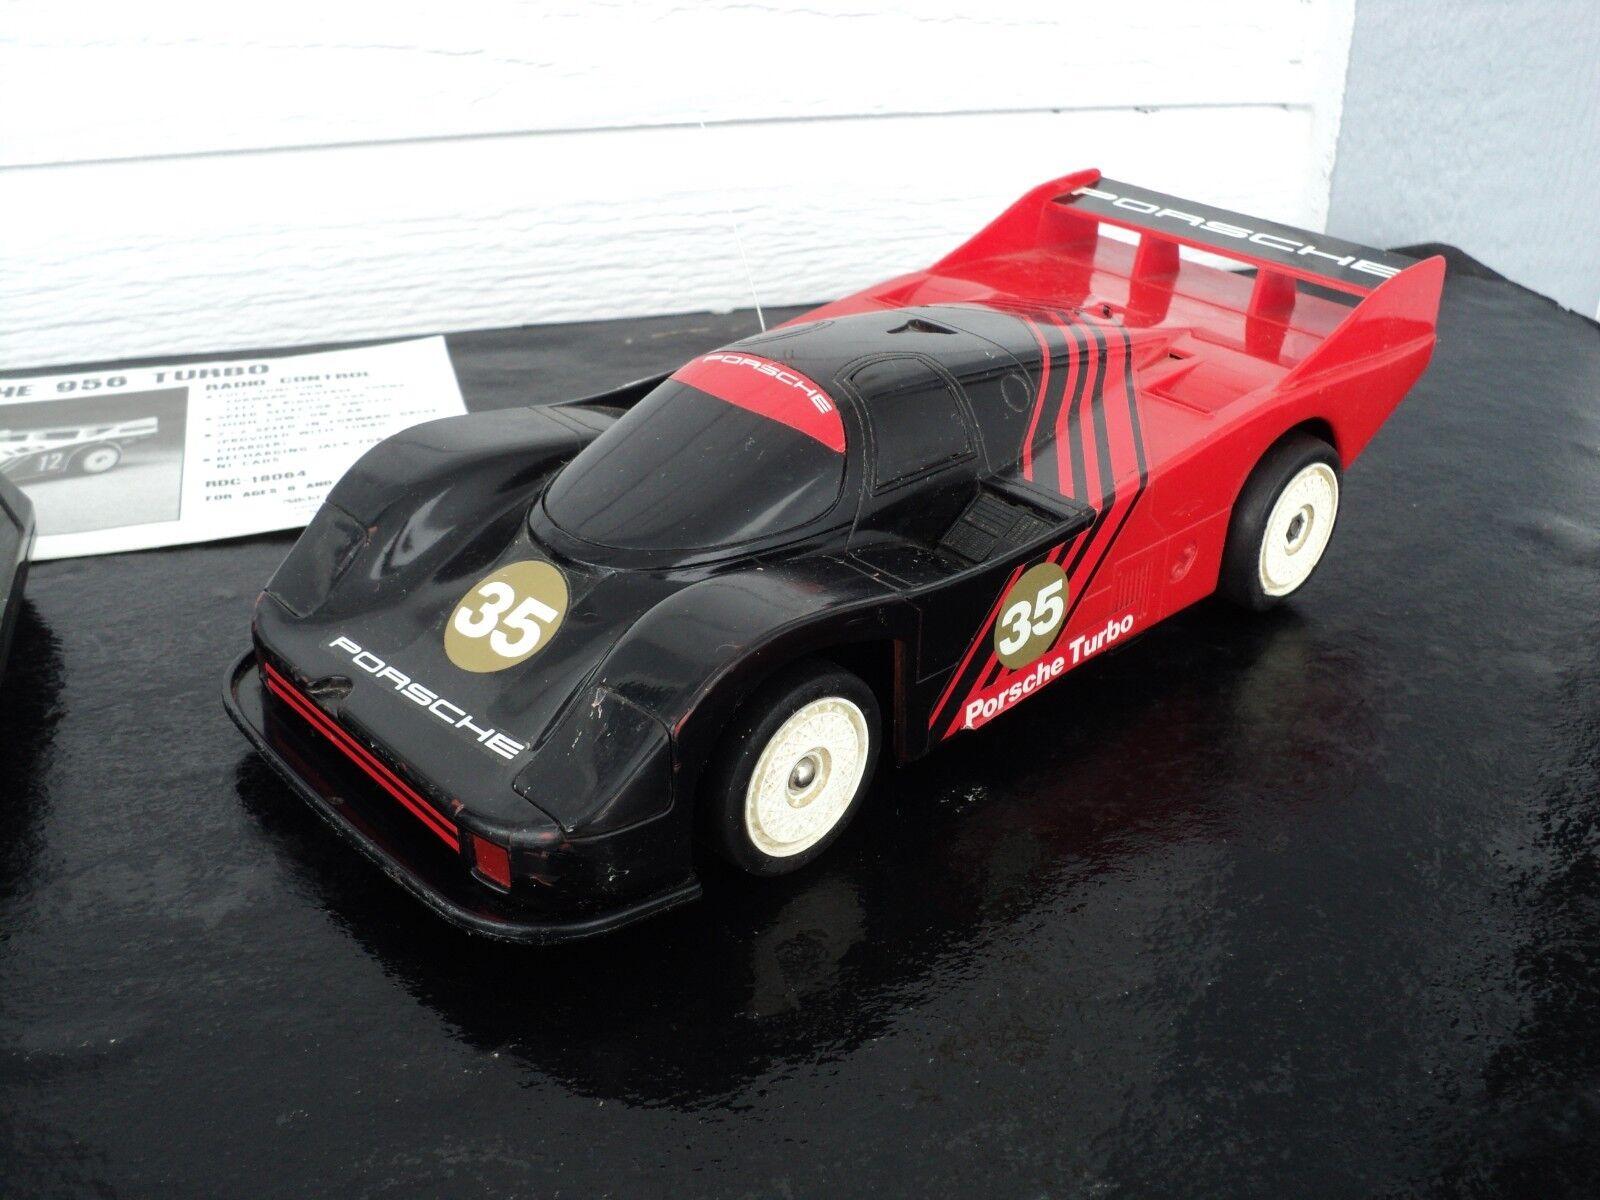 1 18 Nikko Porsche 956 Turbo RTR 1984 SUPER RARE